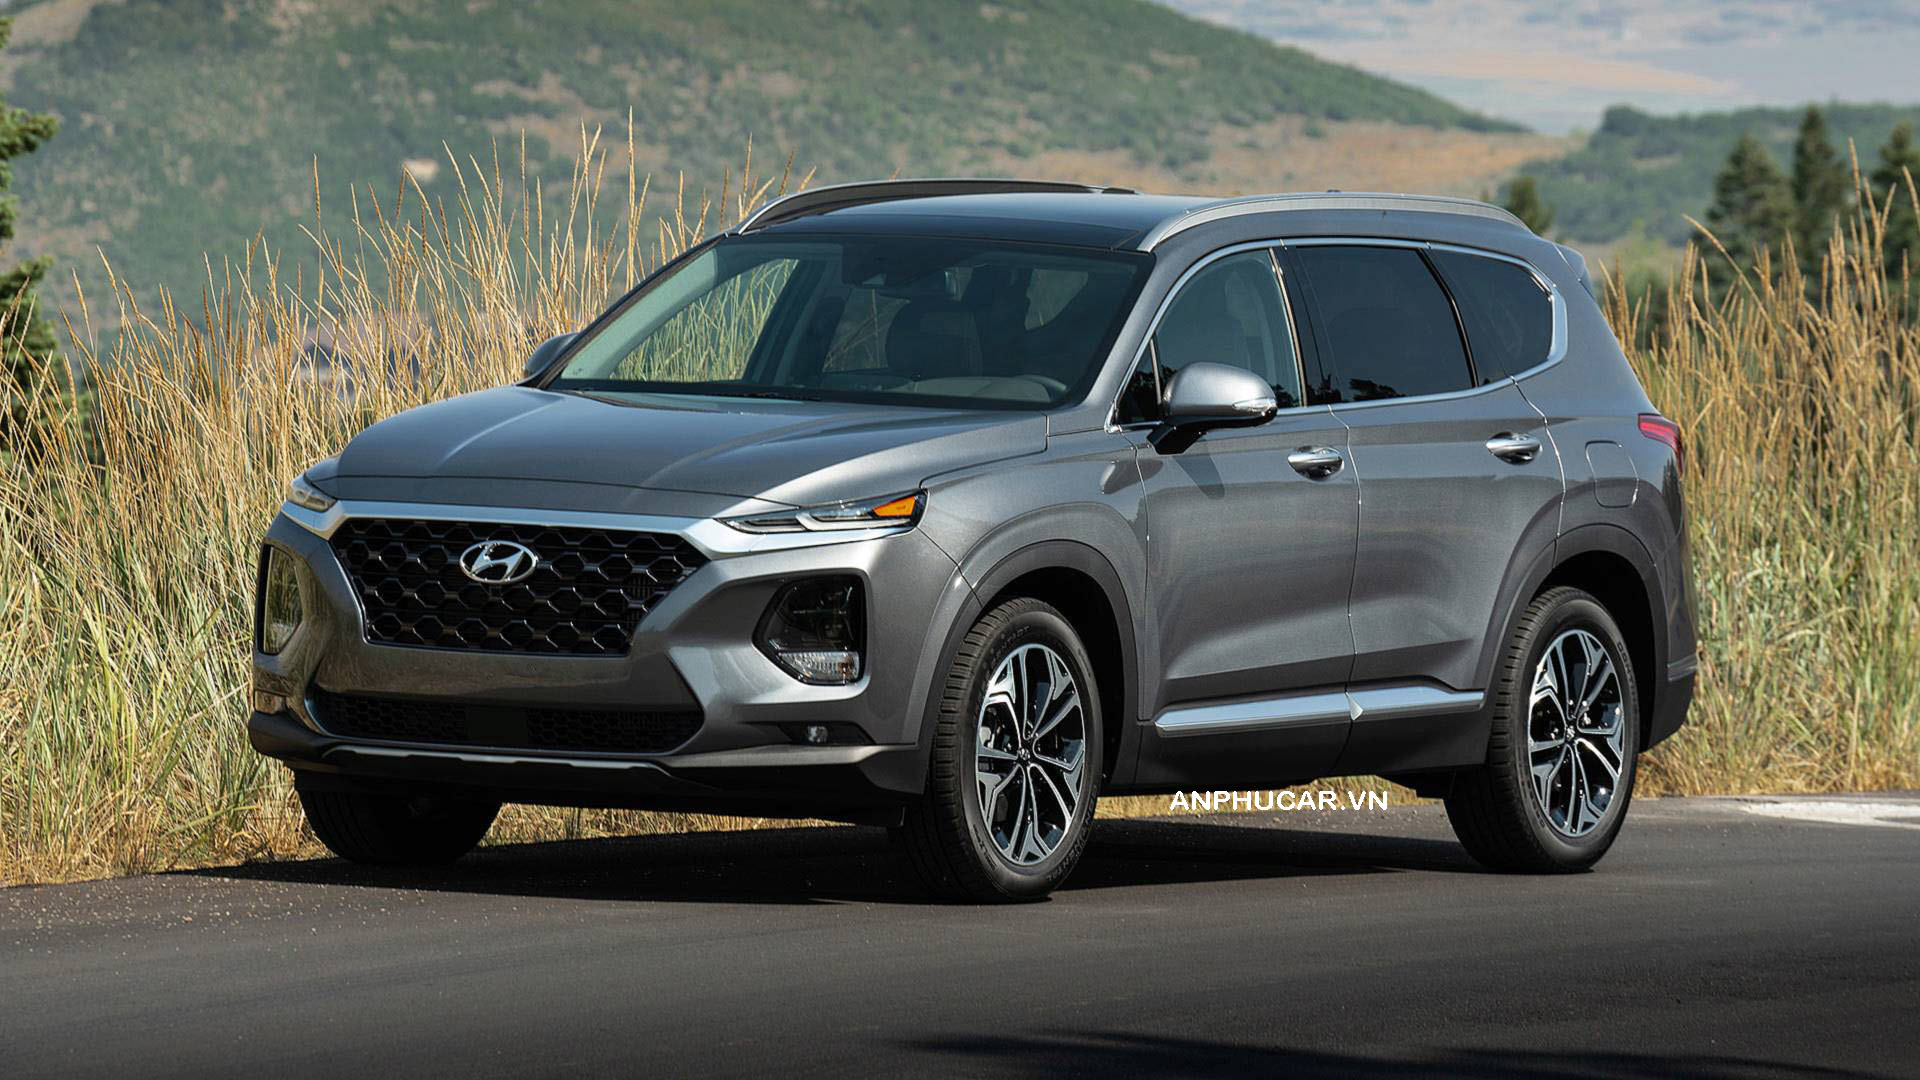 Đánh giá xe Hyundai SantanFe 2020